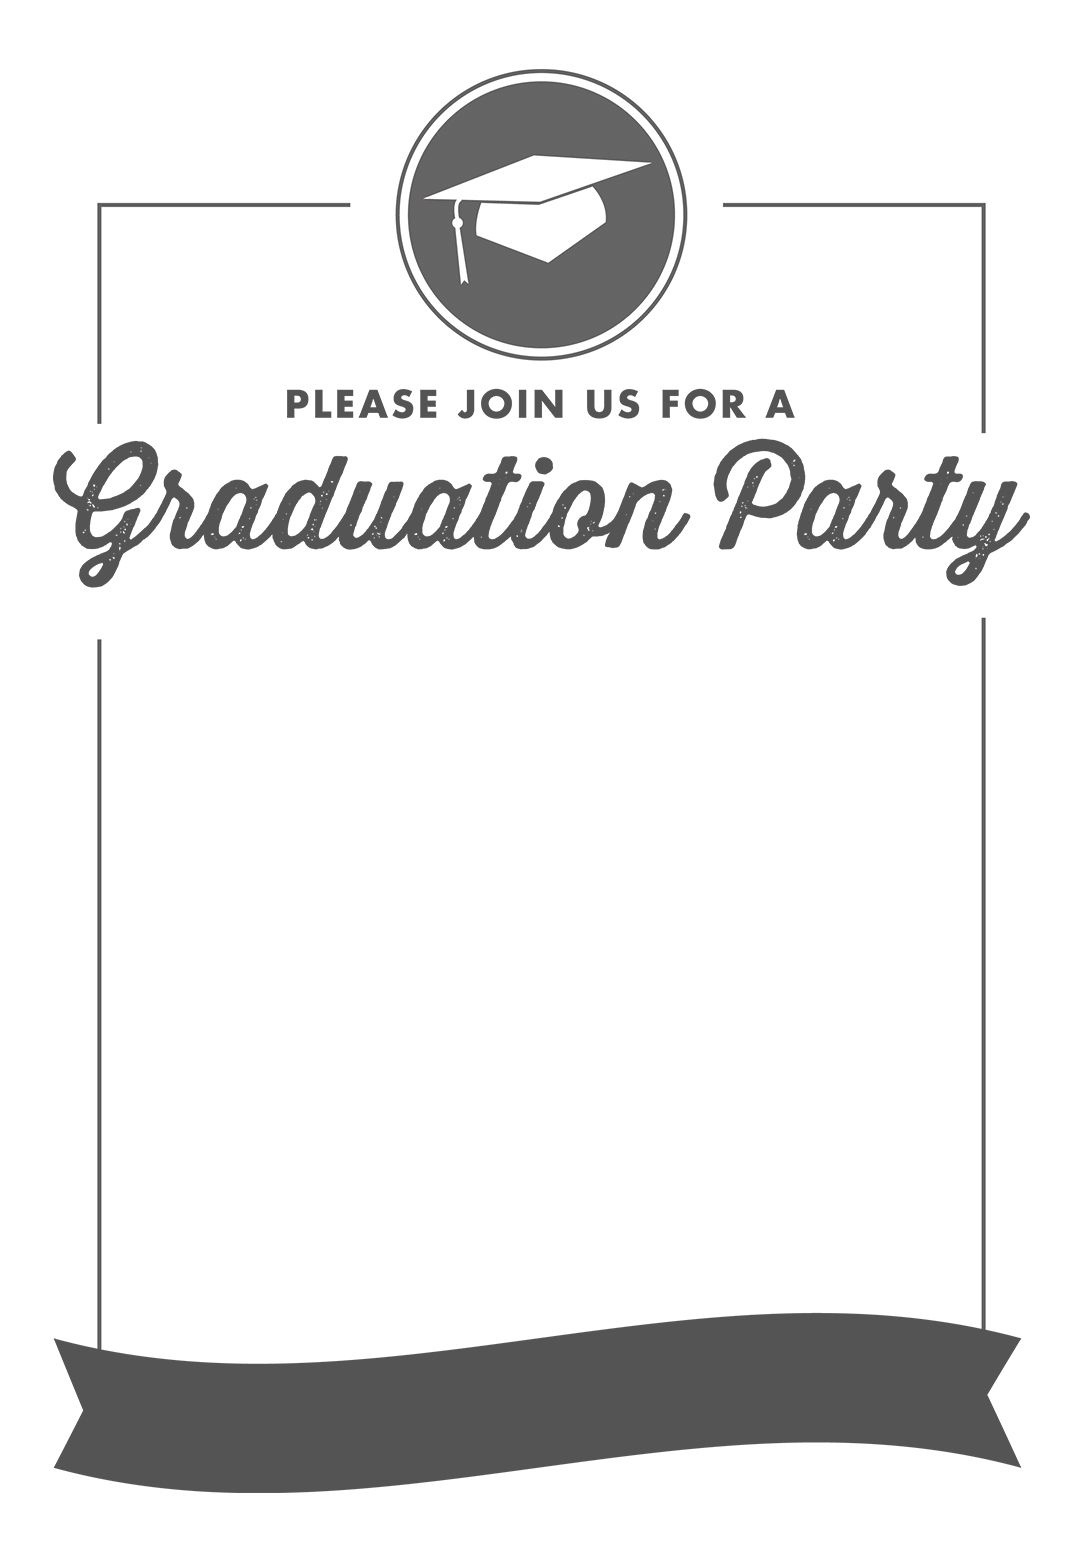 Free Printable Graduation Party Invitation Template | Greetings - Free Printable Graduation Party Invitations 2014